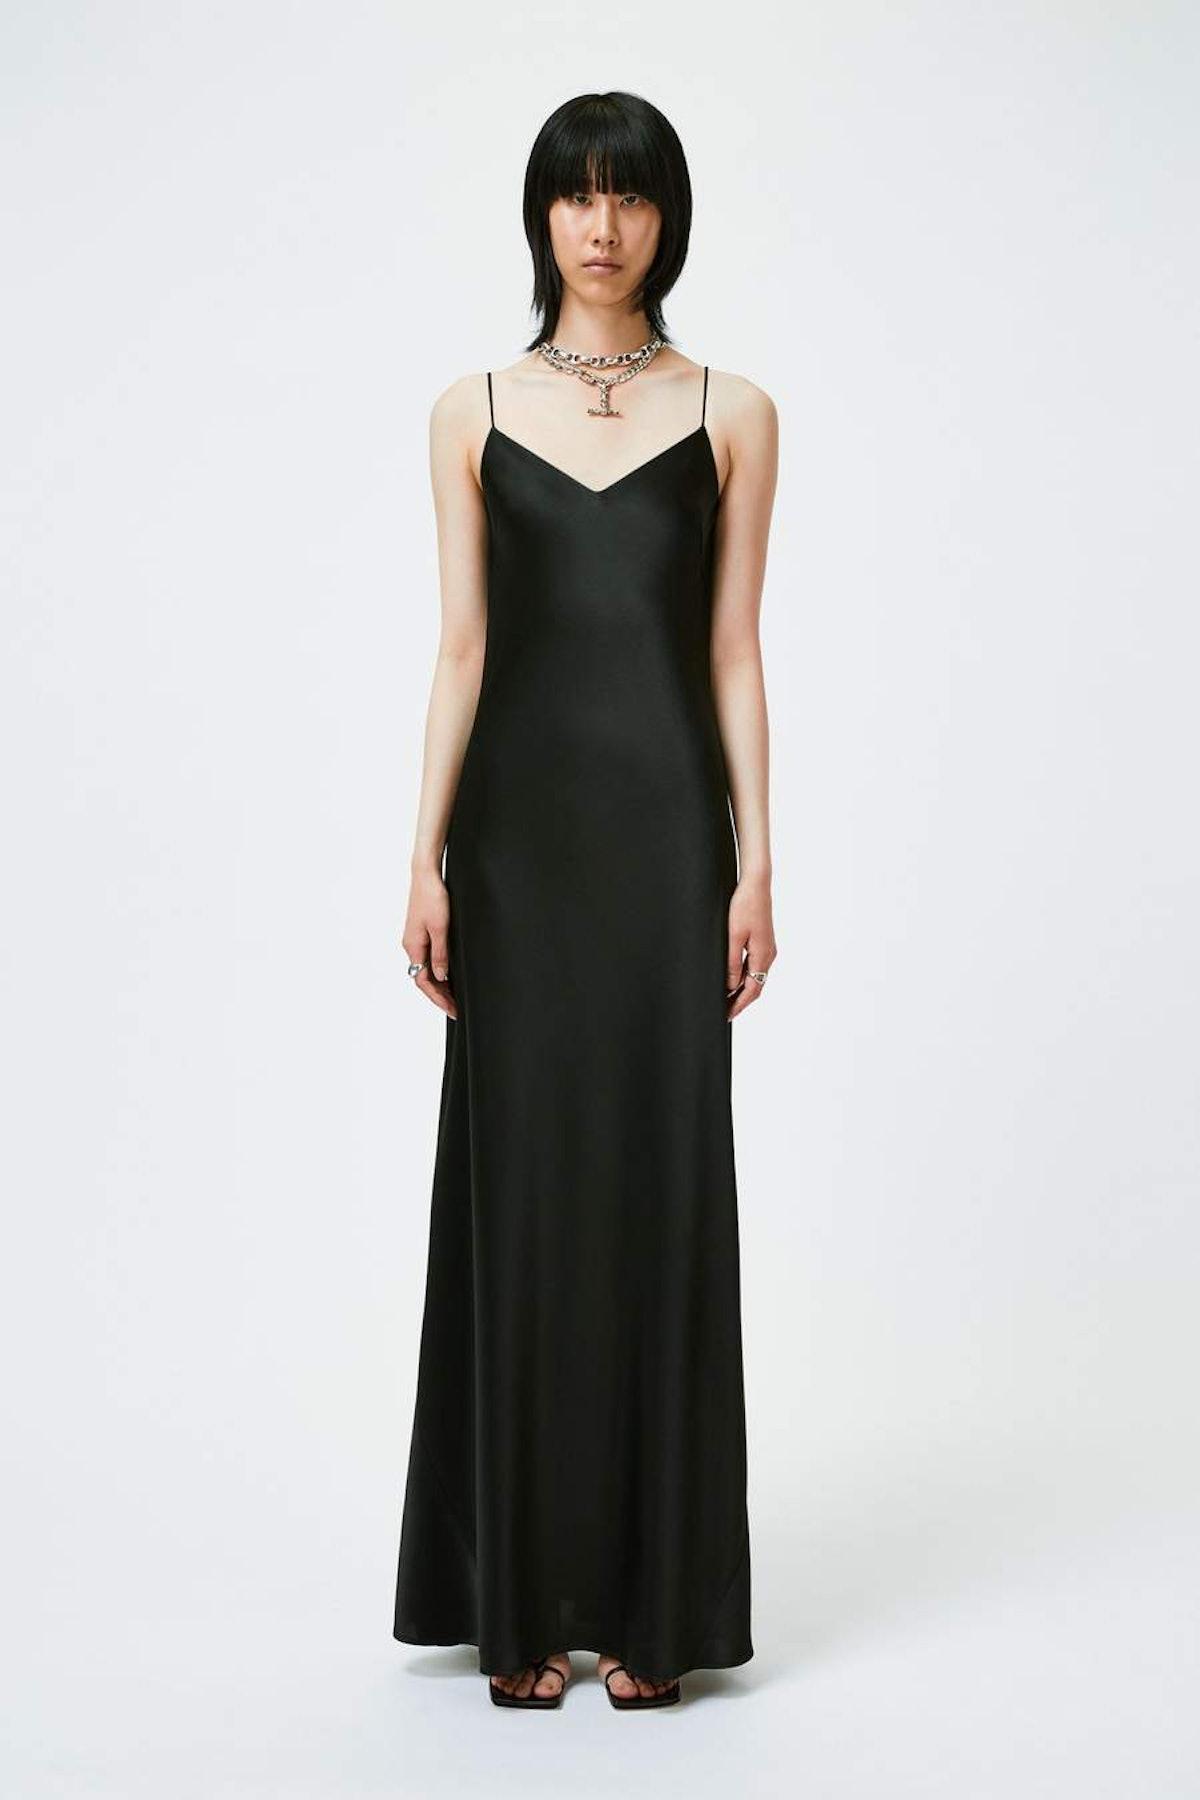 Black satin V-neck slip dress from Galvan London.